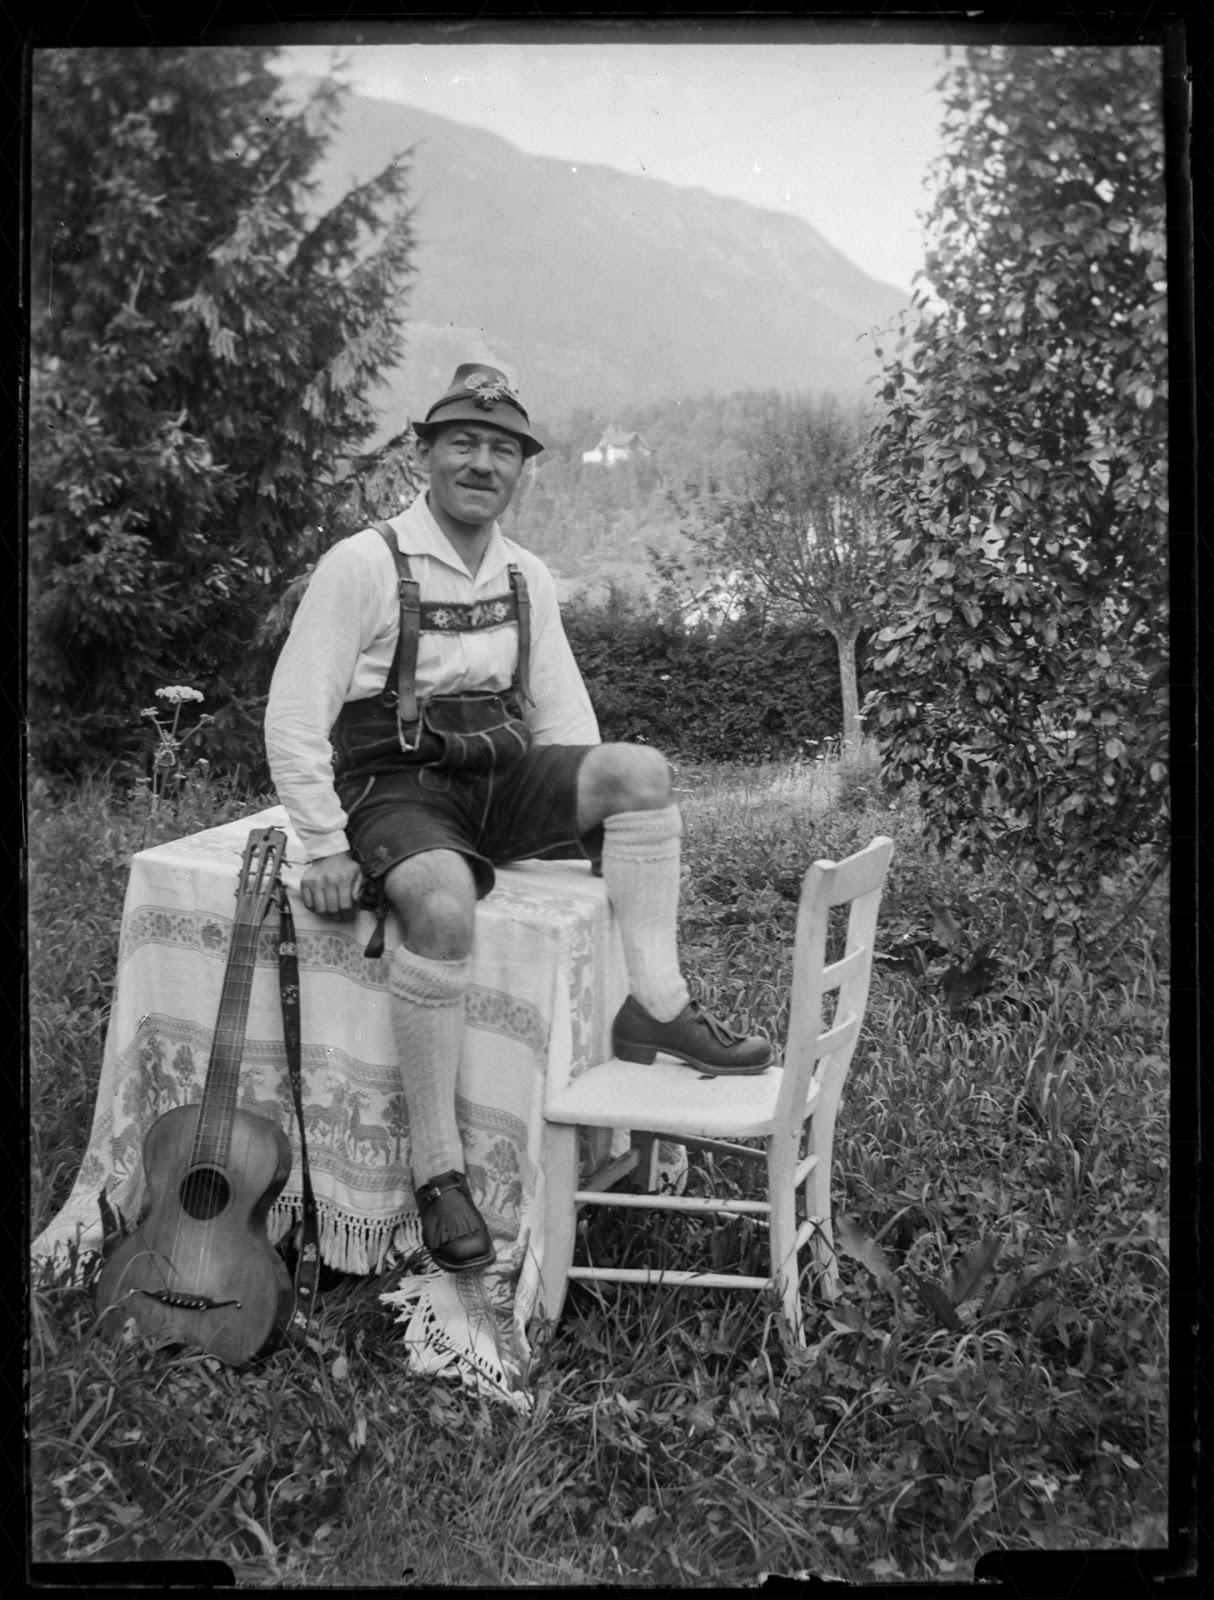 J. Meierhöfer im Selbstportrait um 1920-1930